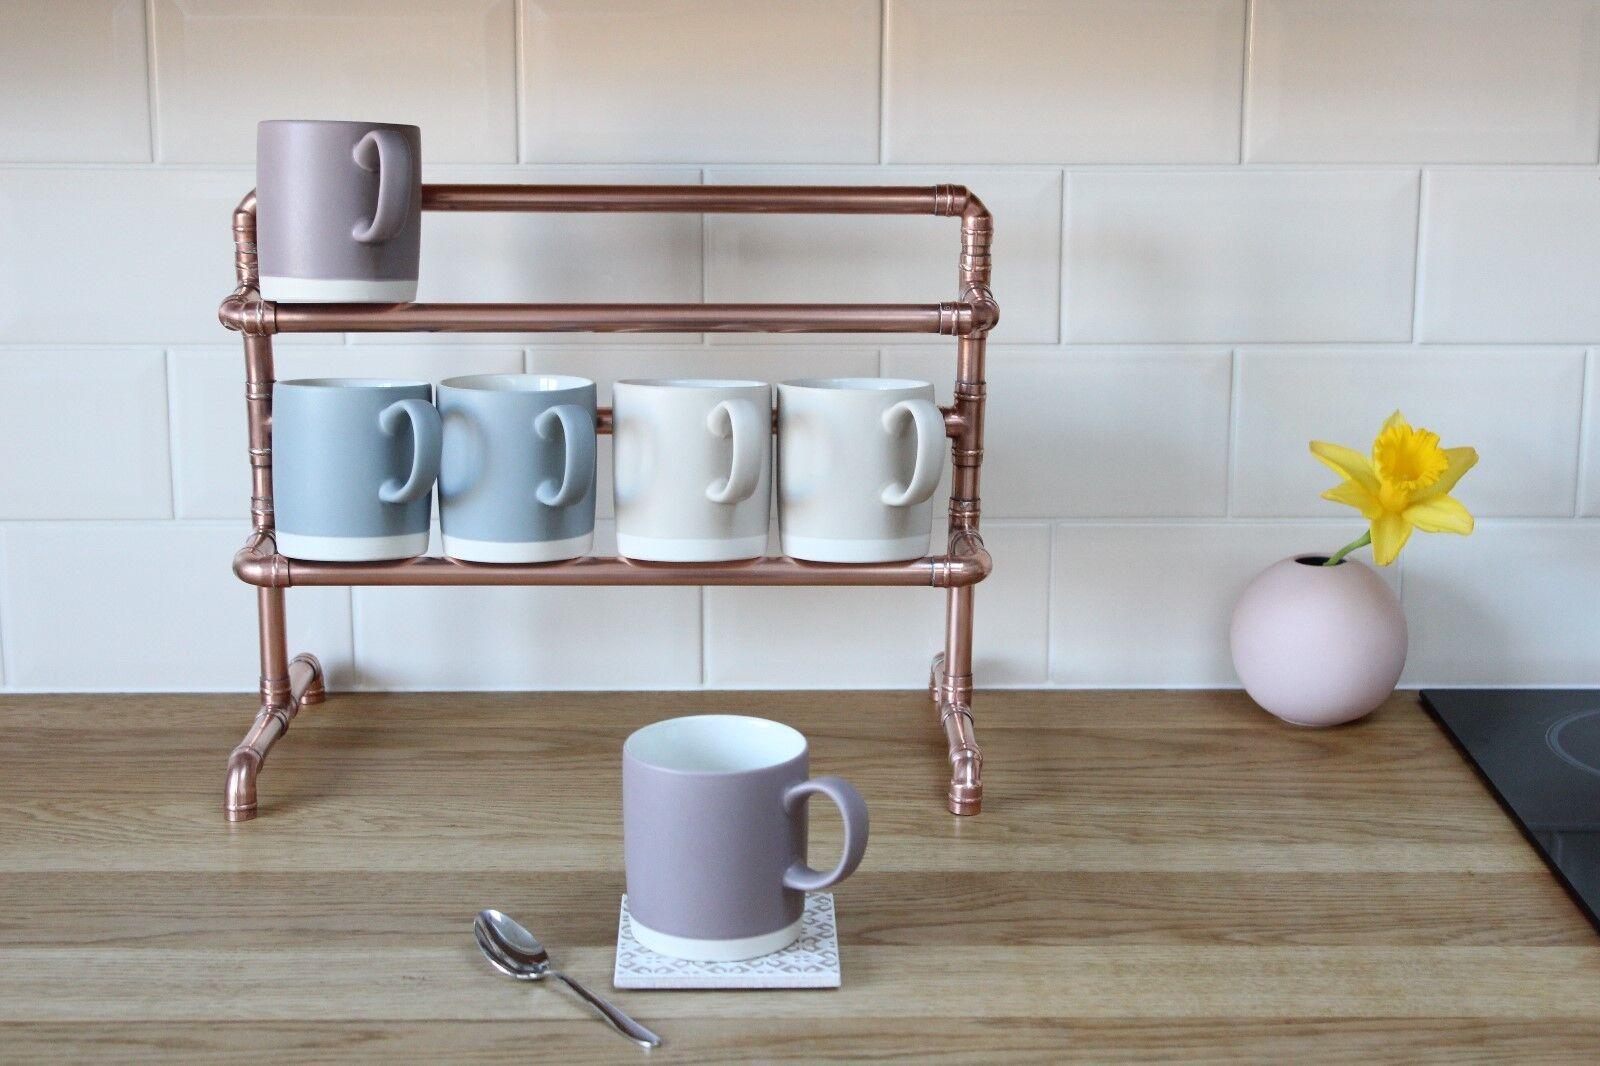 Copper Mug Holder, Tea Cup Stand, Handmade Bespoke Industrial Metal Vintage